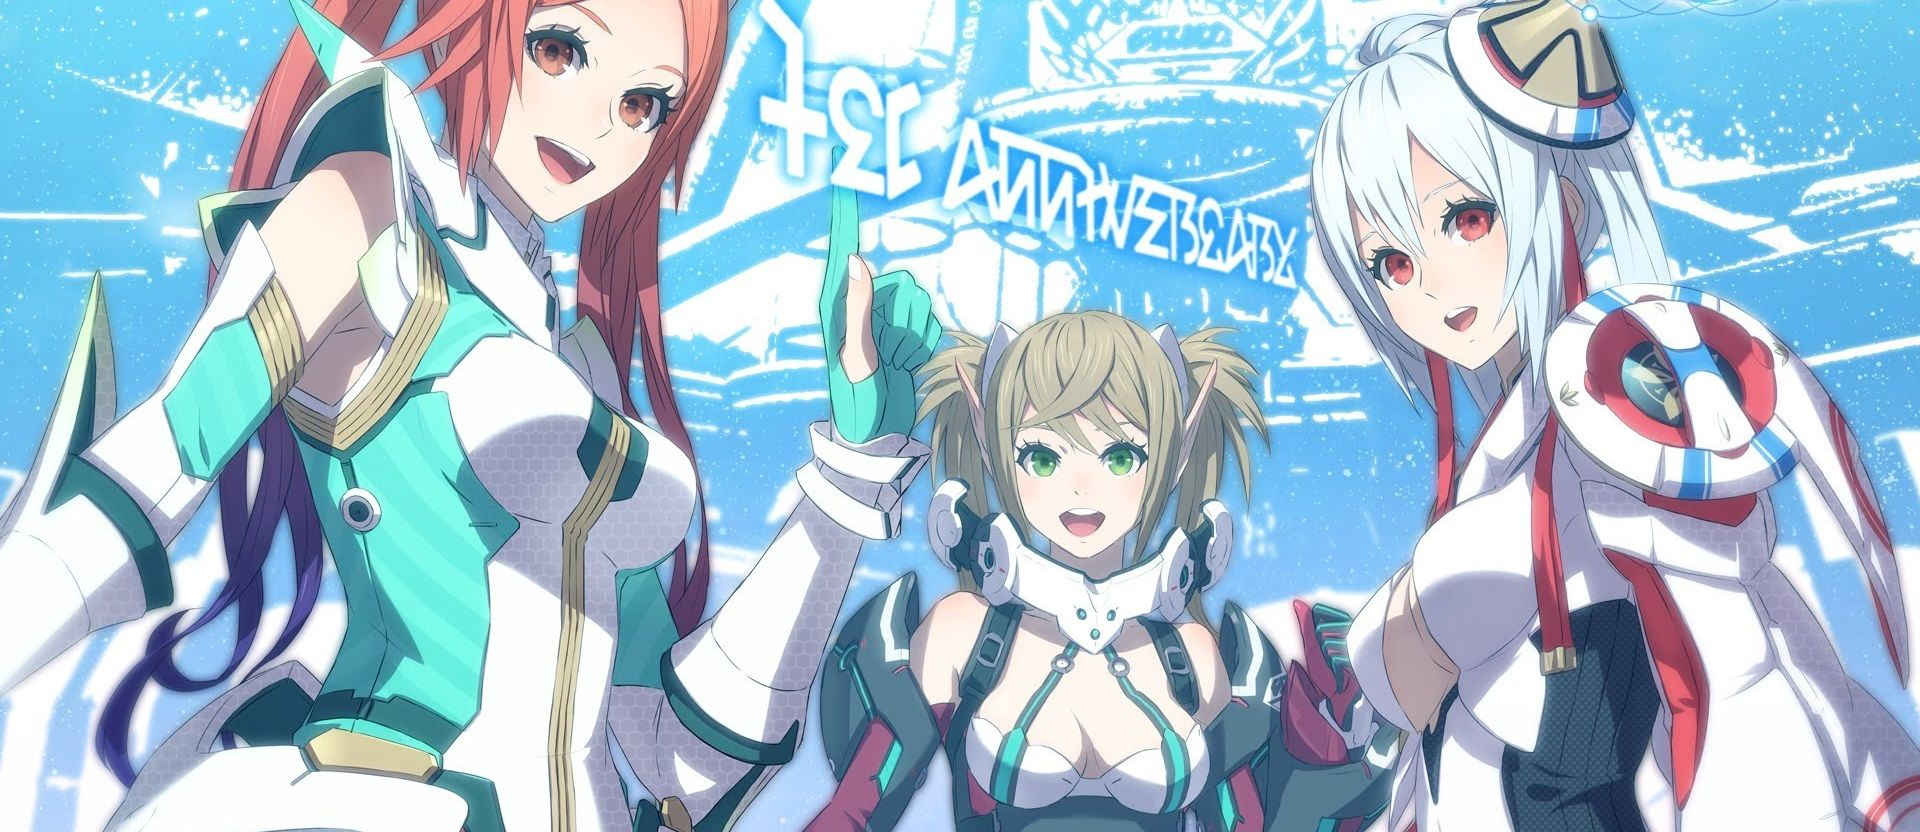 Phantasy Star Online 2 is Getting an Anime Series ゲーム